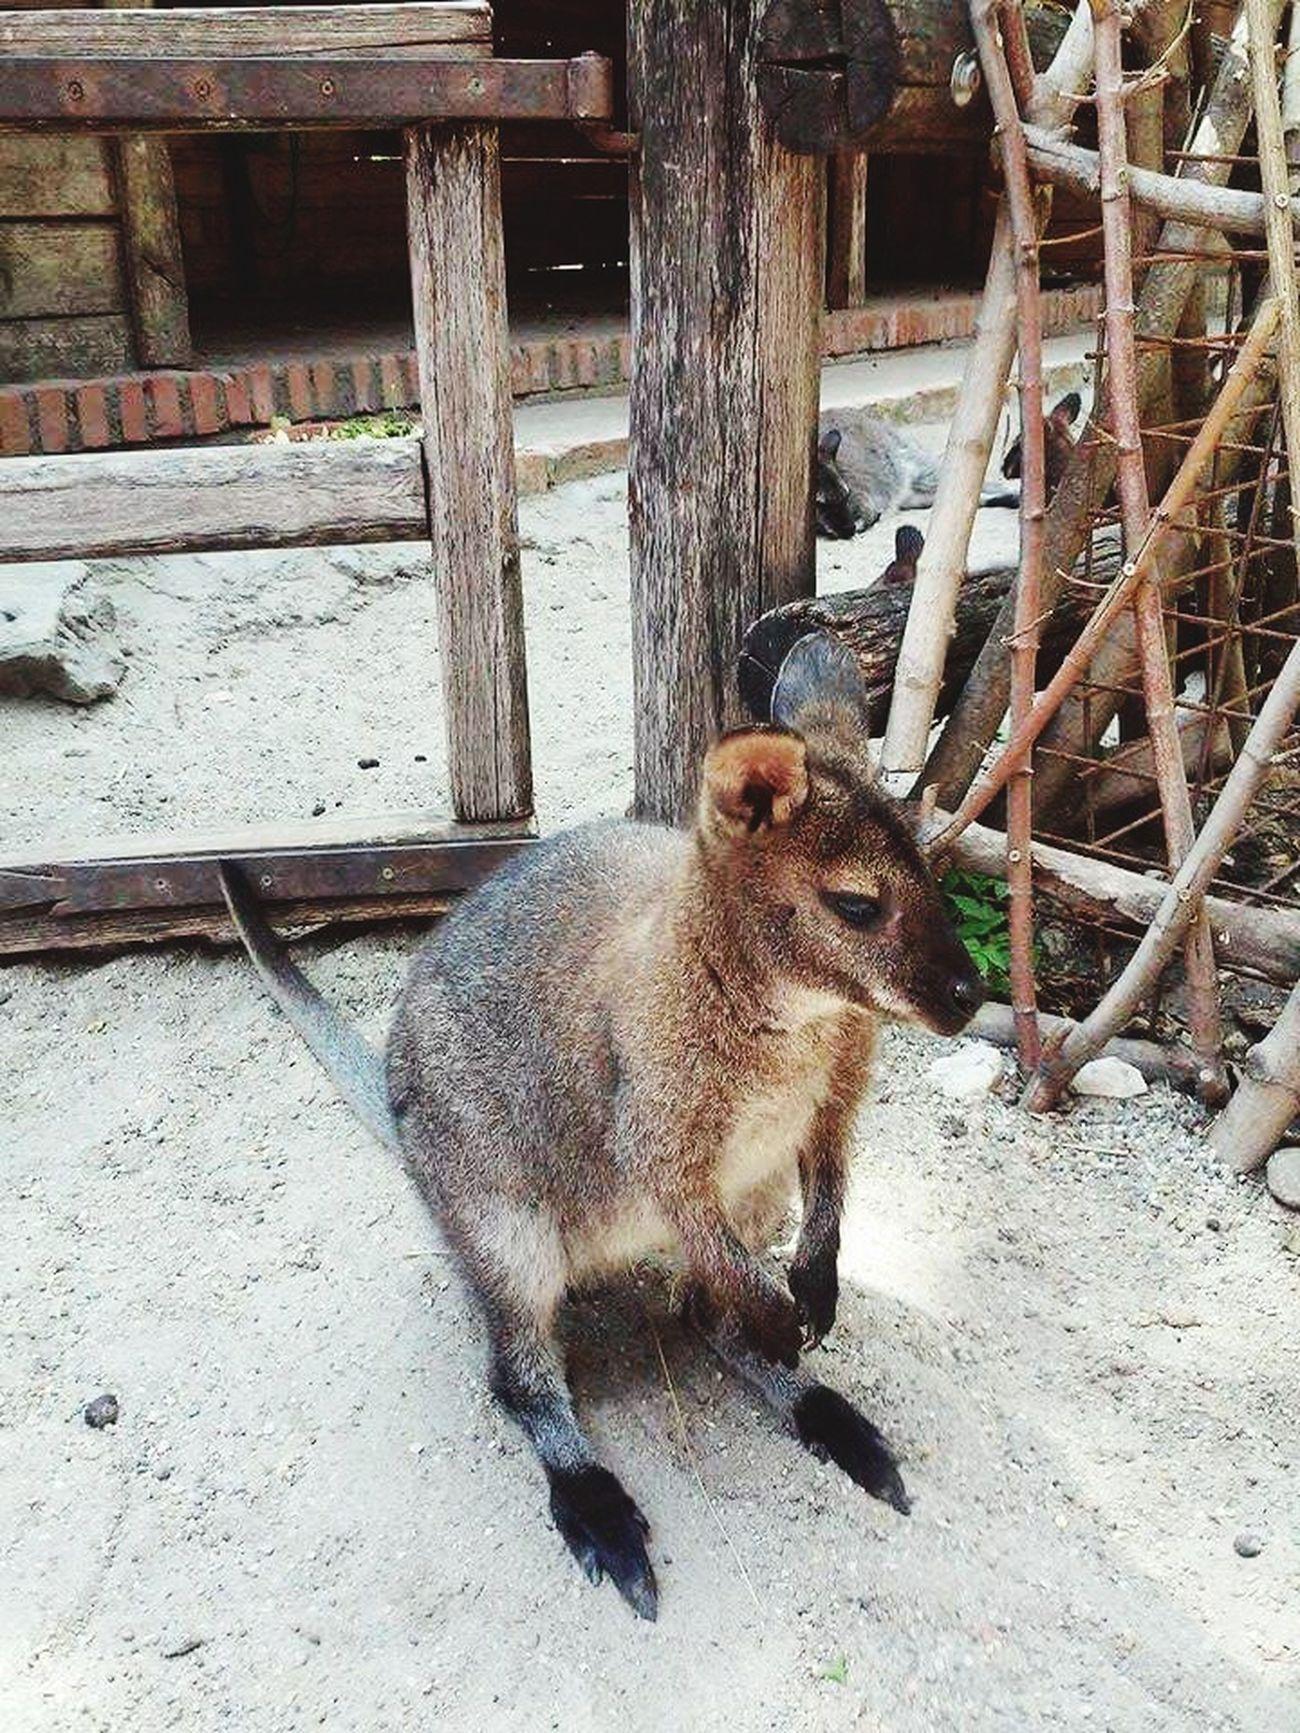 Kangoo Beautiful ♥ Horny ☜ Cheese! Beautiful Day Taking Photos